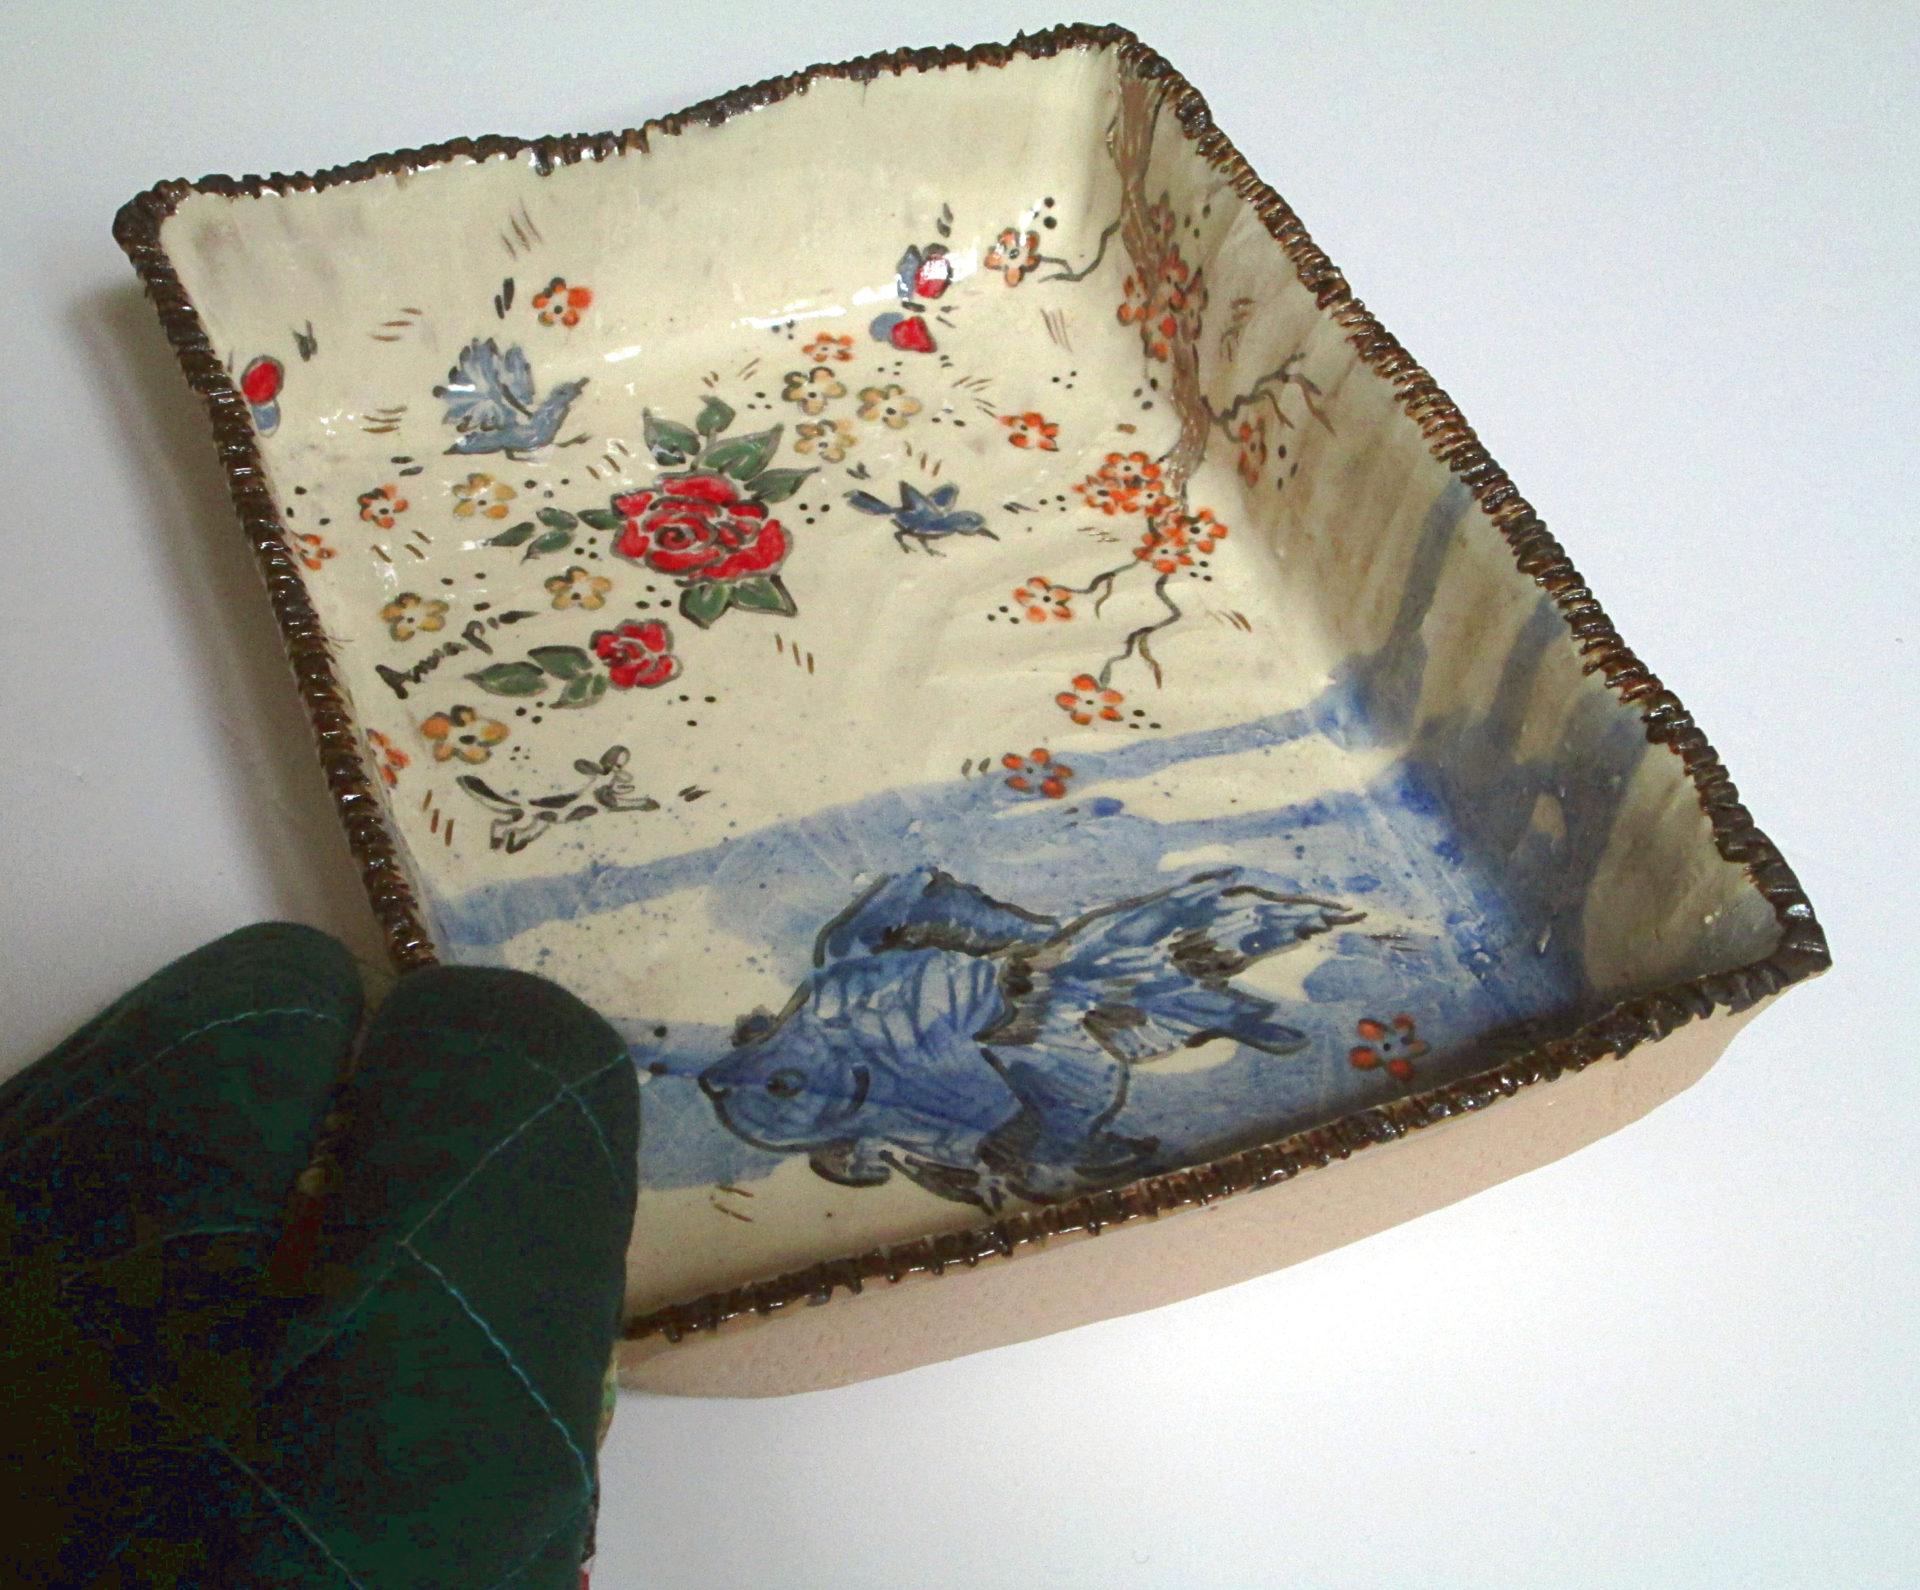 Annapia Sogliani teglia in ceramica fatta e decorata a mano engobbio, plat à four céramique faite et décorée main grès décor engobe